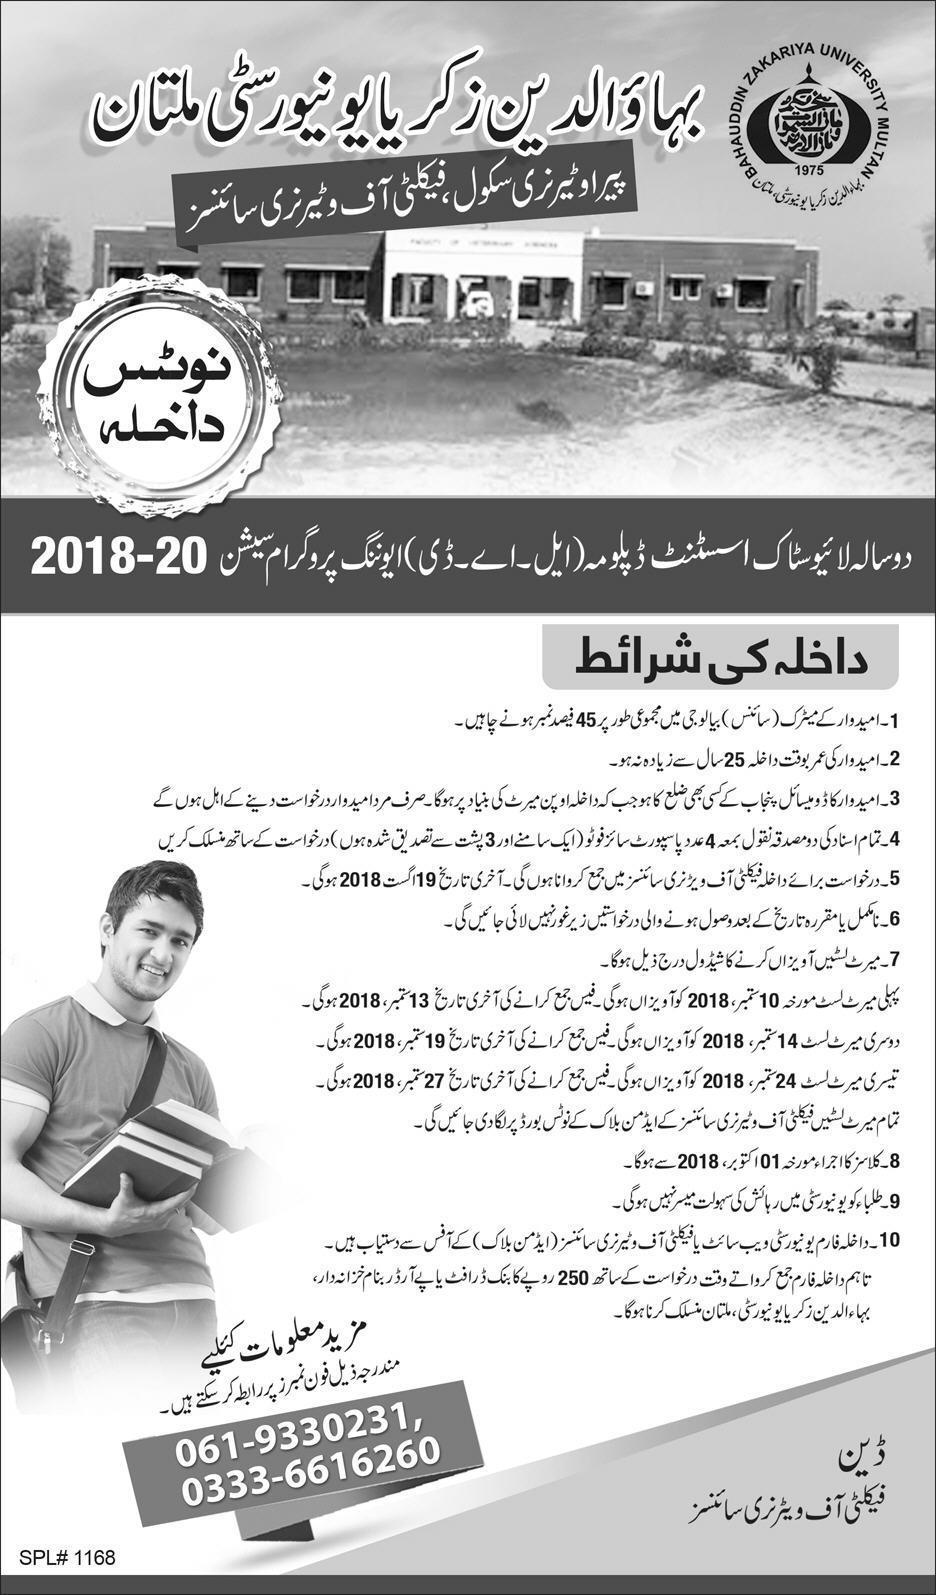 BZU Admission LDA course last date